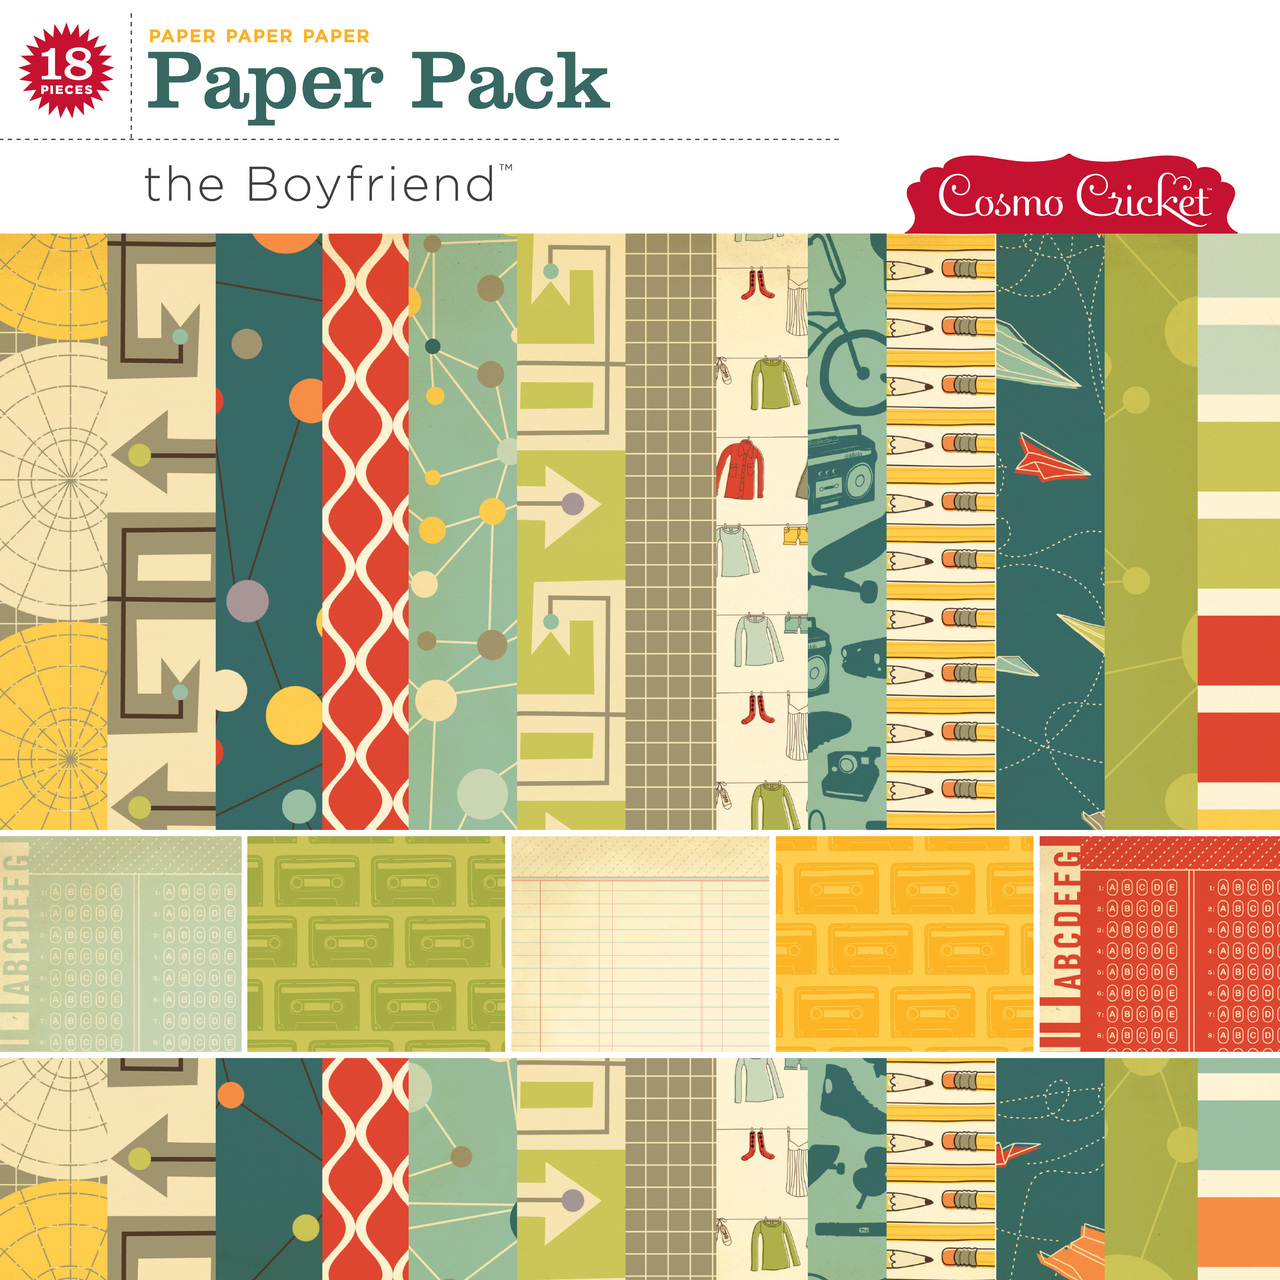 The Boyfriend Paper Pack